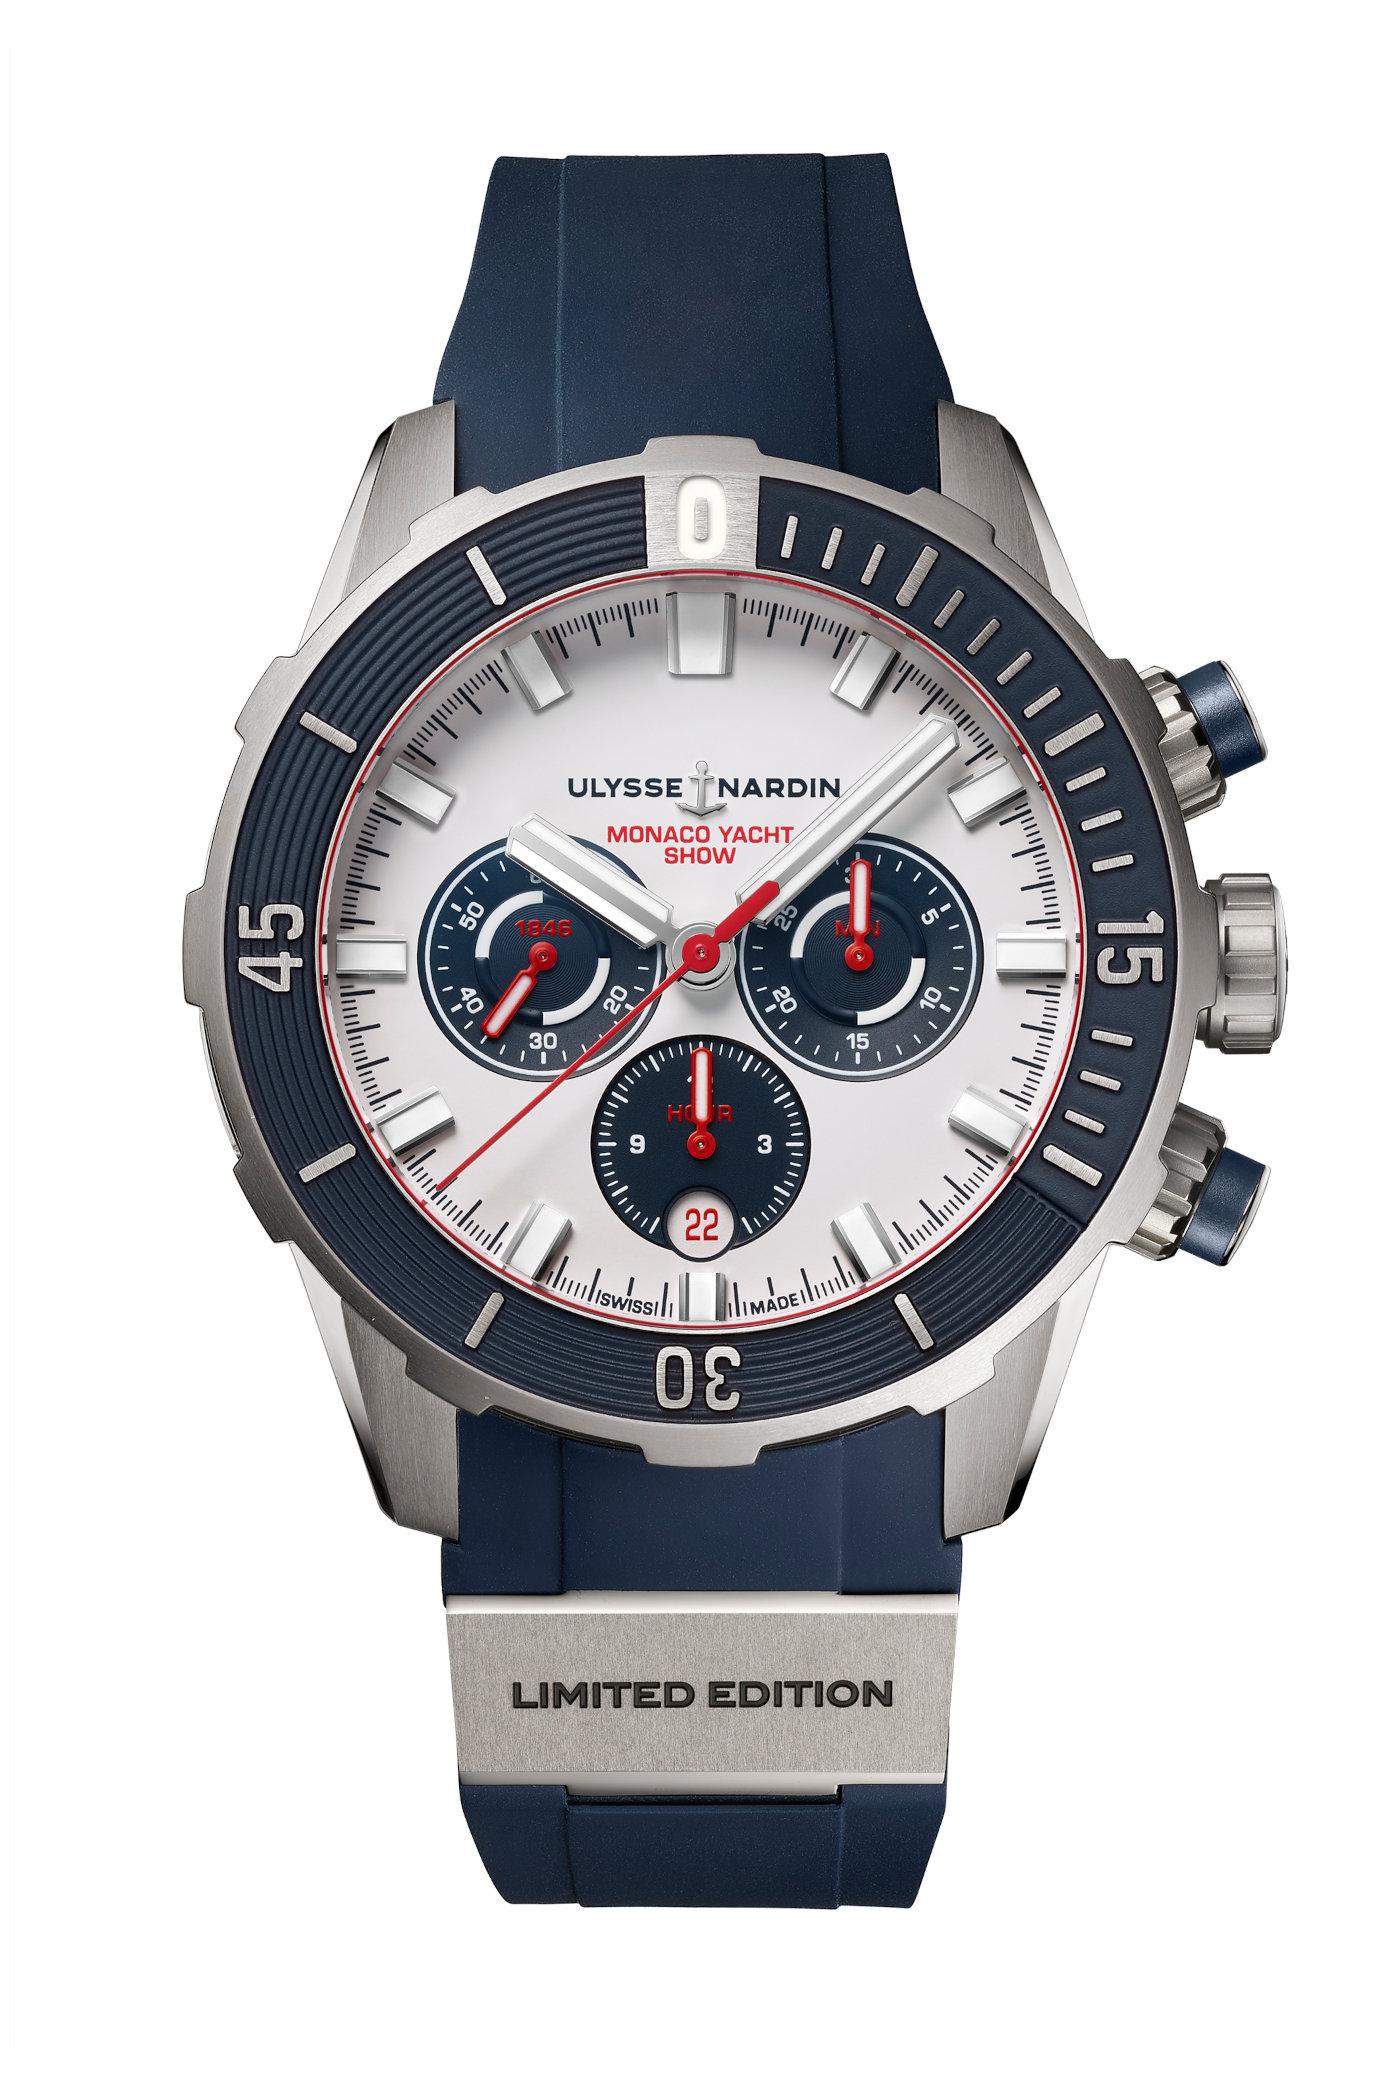 Ulysse Nardin Diver Chronograph Monaco Yacht Show Limited Edition 2021 2